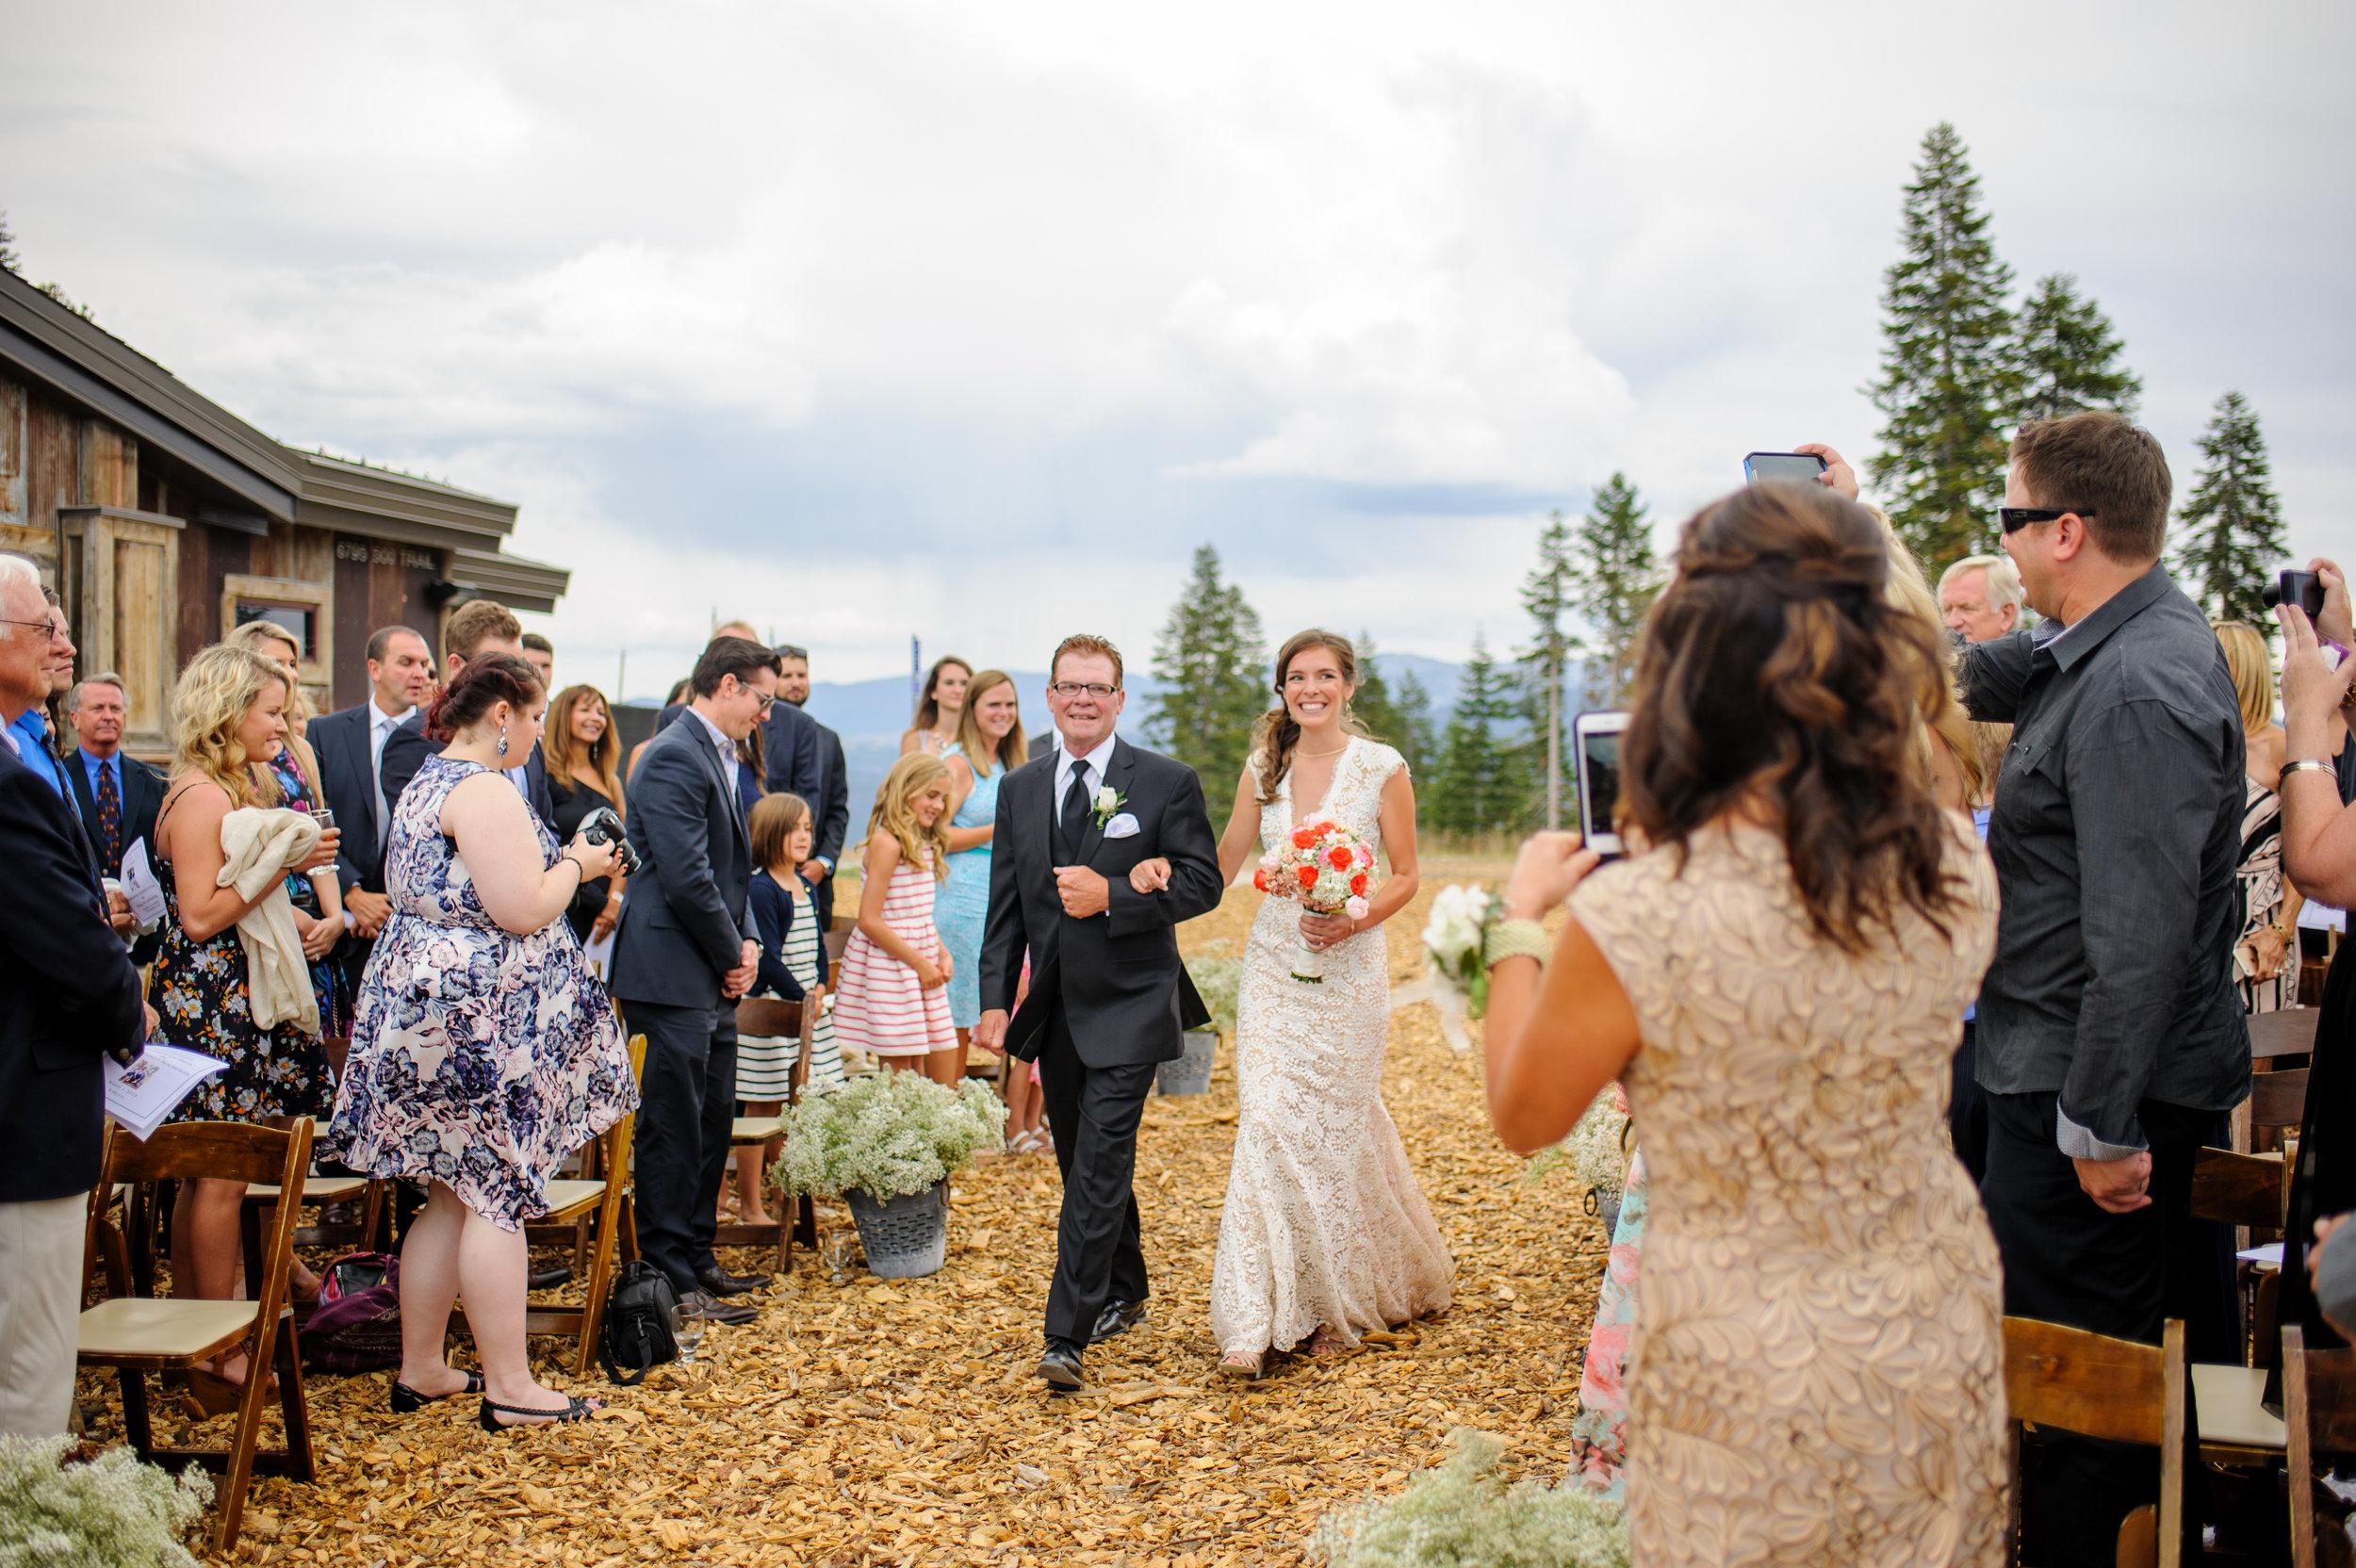 katie-myles-016-northstar-resort-tahoe-wedding-photographer-katherine-nicole-photography.JPG